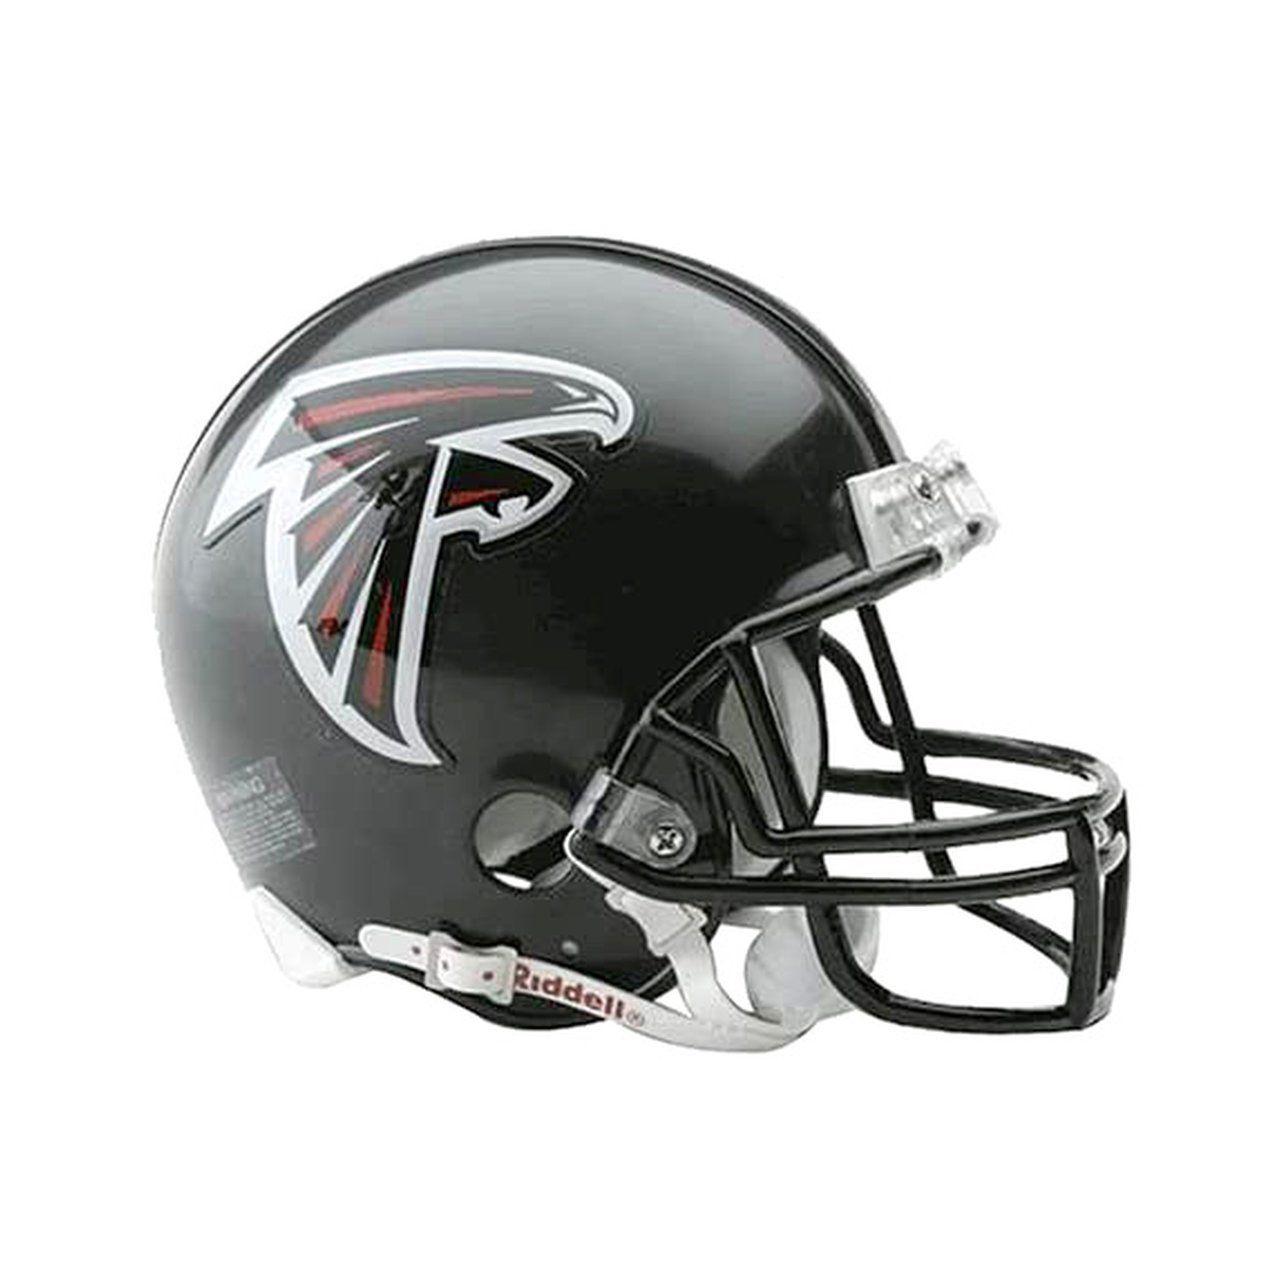 amfoo - Riddell VSR4 Mini Football Helm - Atlanta Falcons 2003-2019